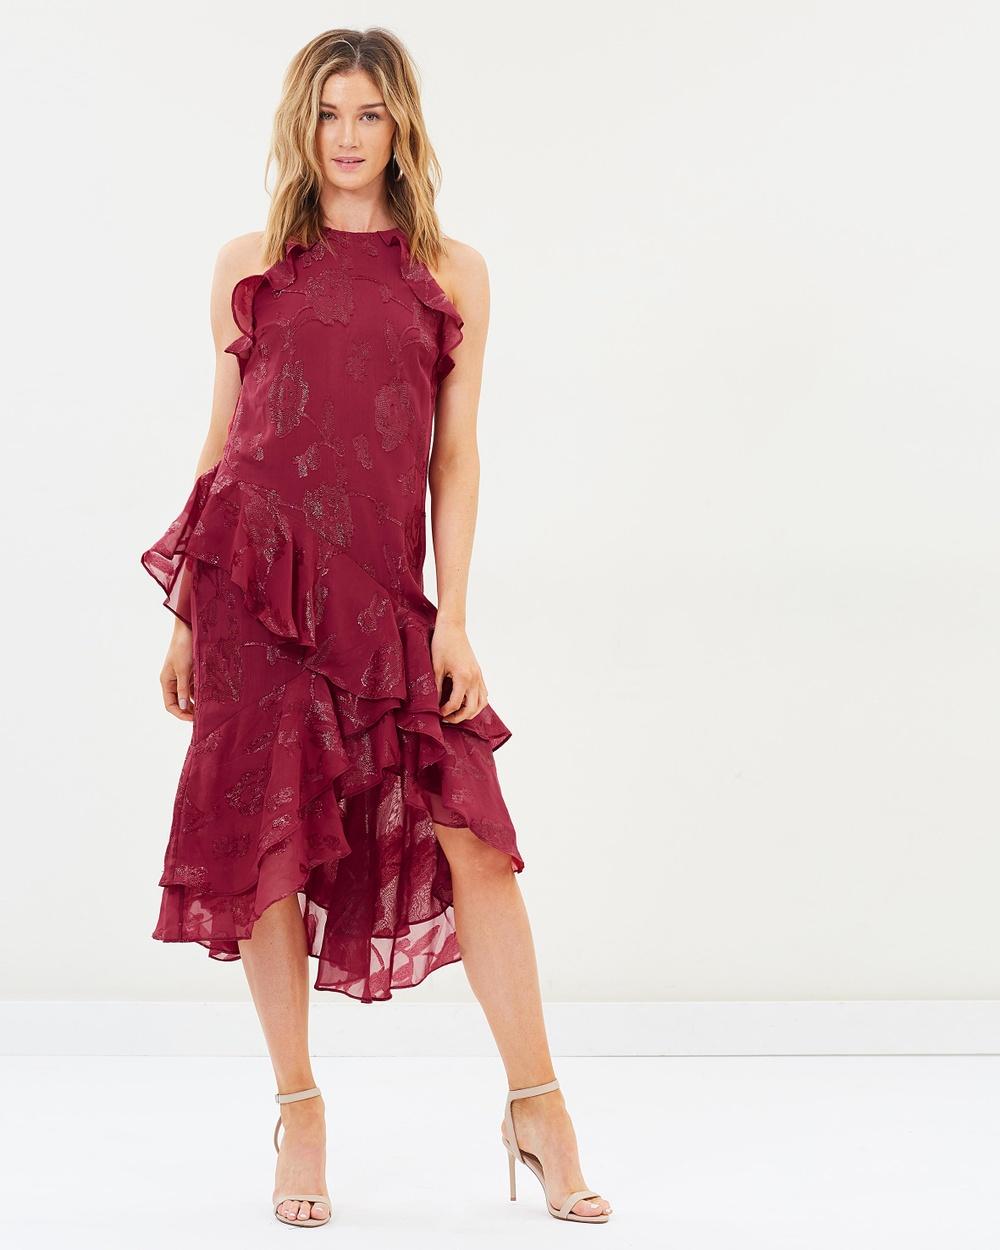 Cooper St Ophelia Sleeveless Frill Dress Bridesmaid Dresses Mulberry Ophelia Sleeveless Frill Dress